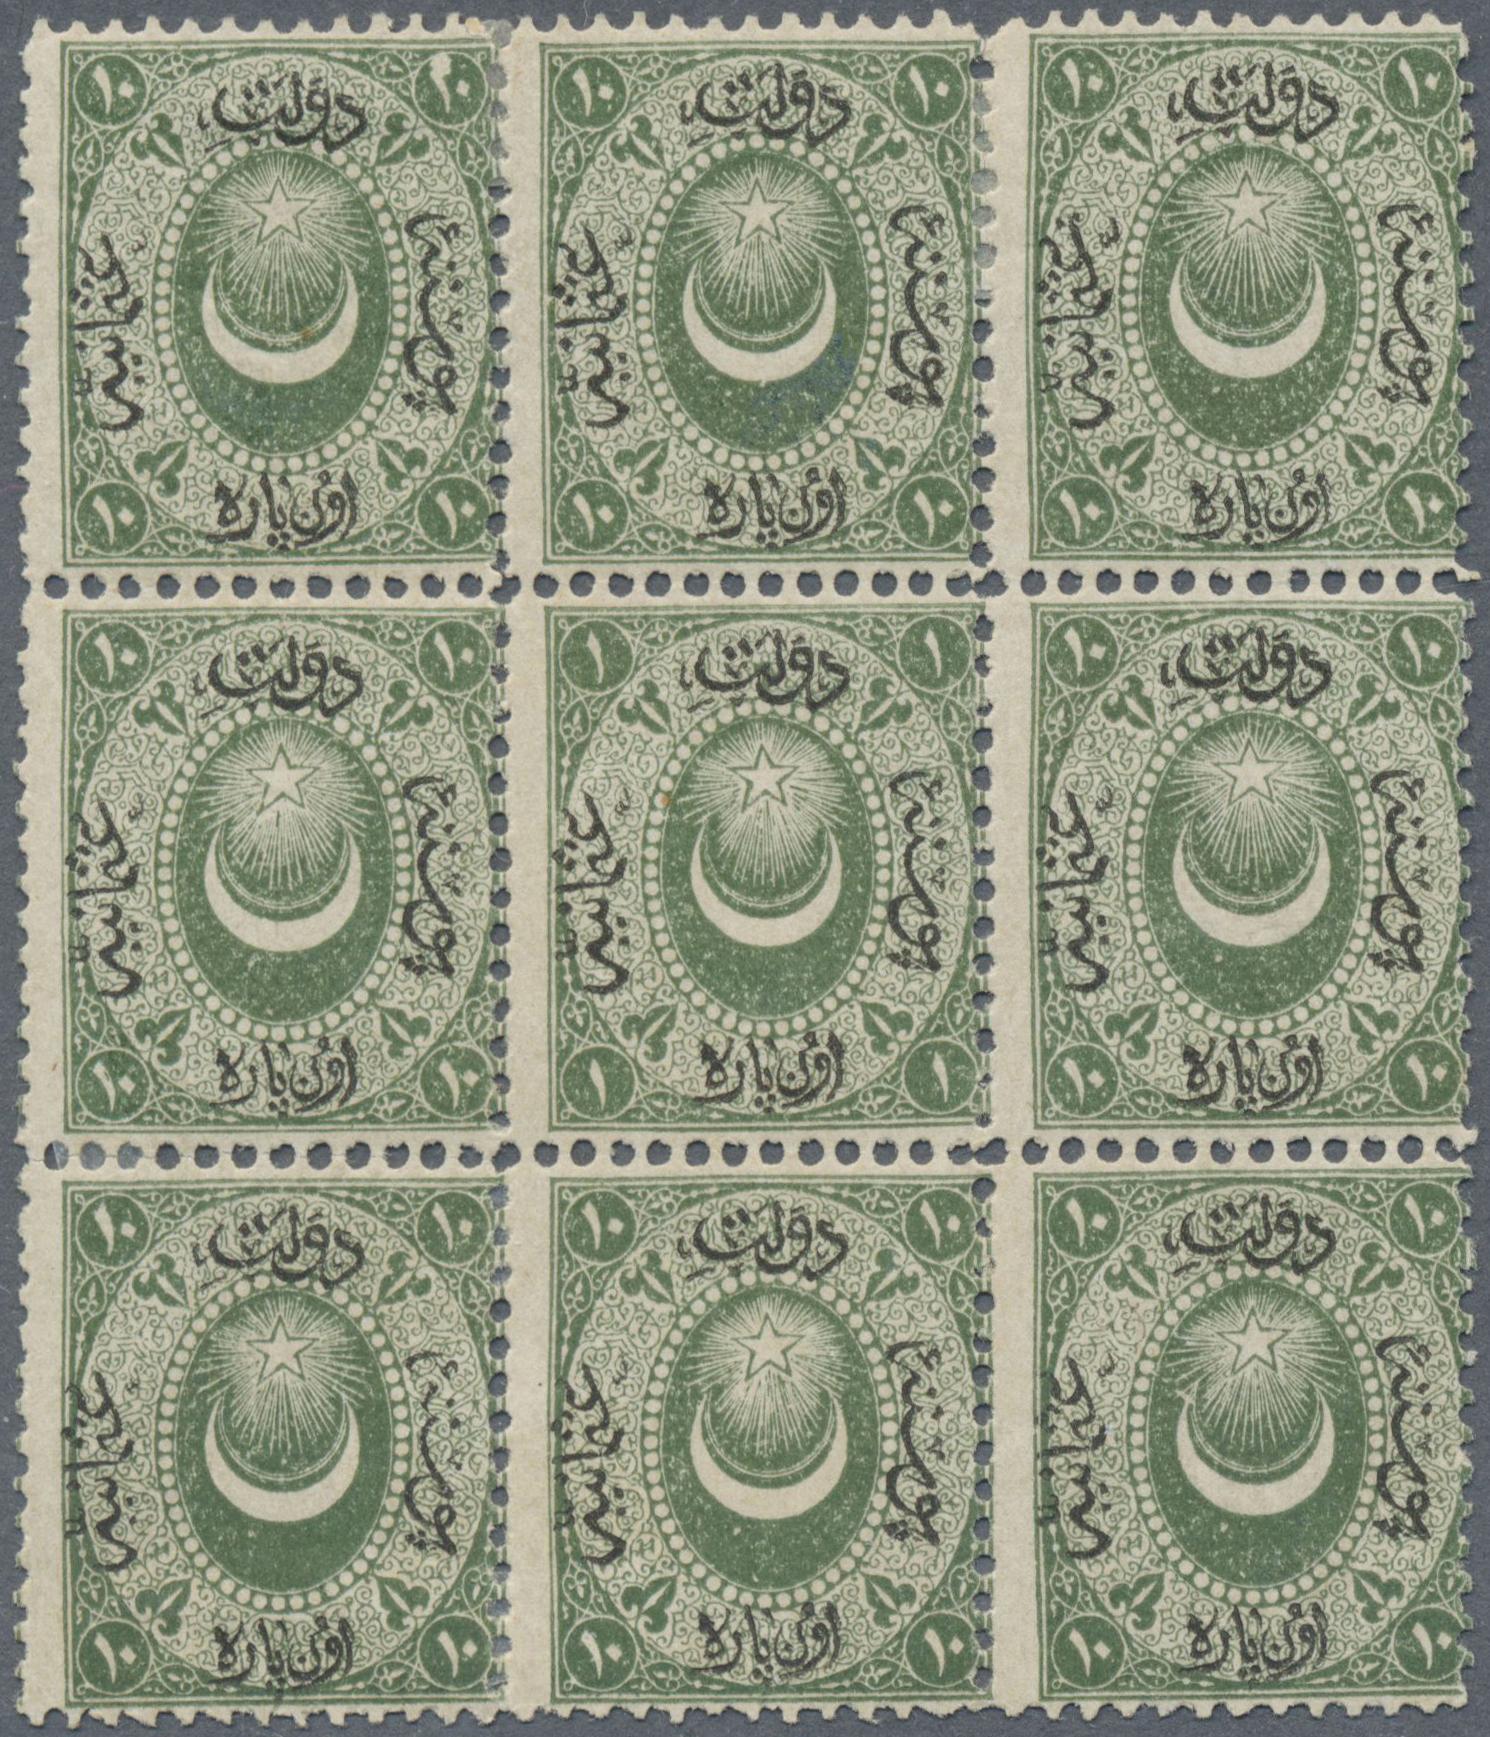 Lot 14947 - türkei  -  Auktionshaus Christoph Gärtner GmbH & Co. KG Sale #47 Single lots: Asia, Thematics, Overseas, Europe